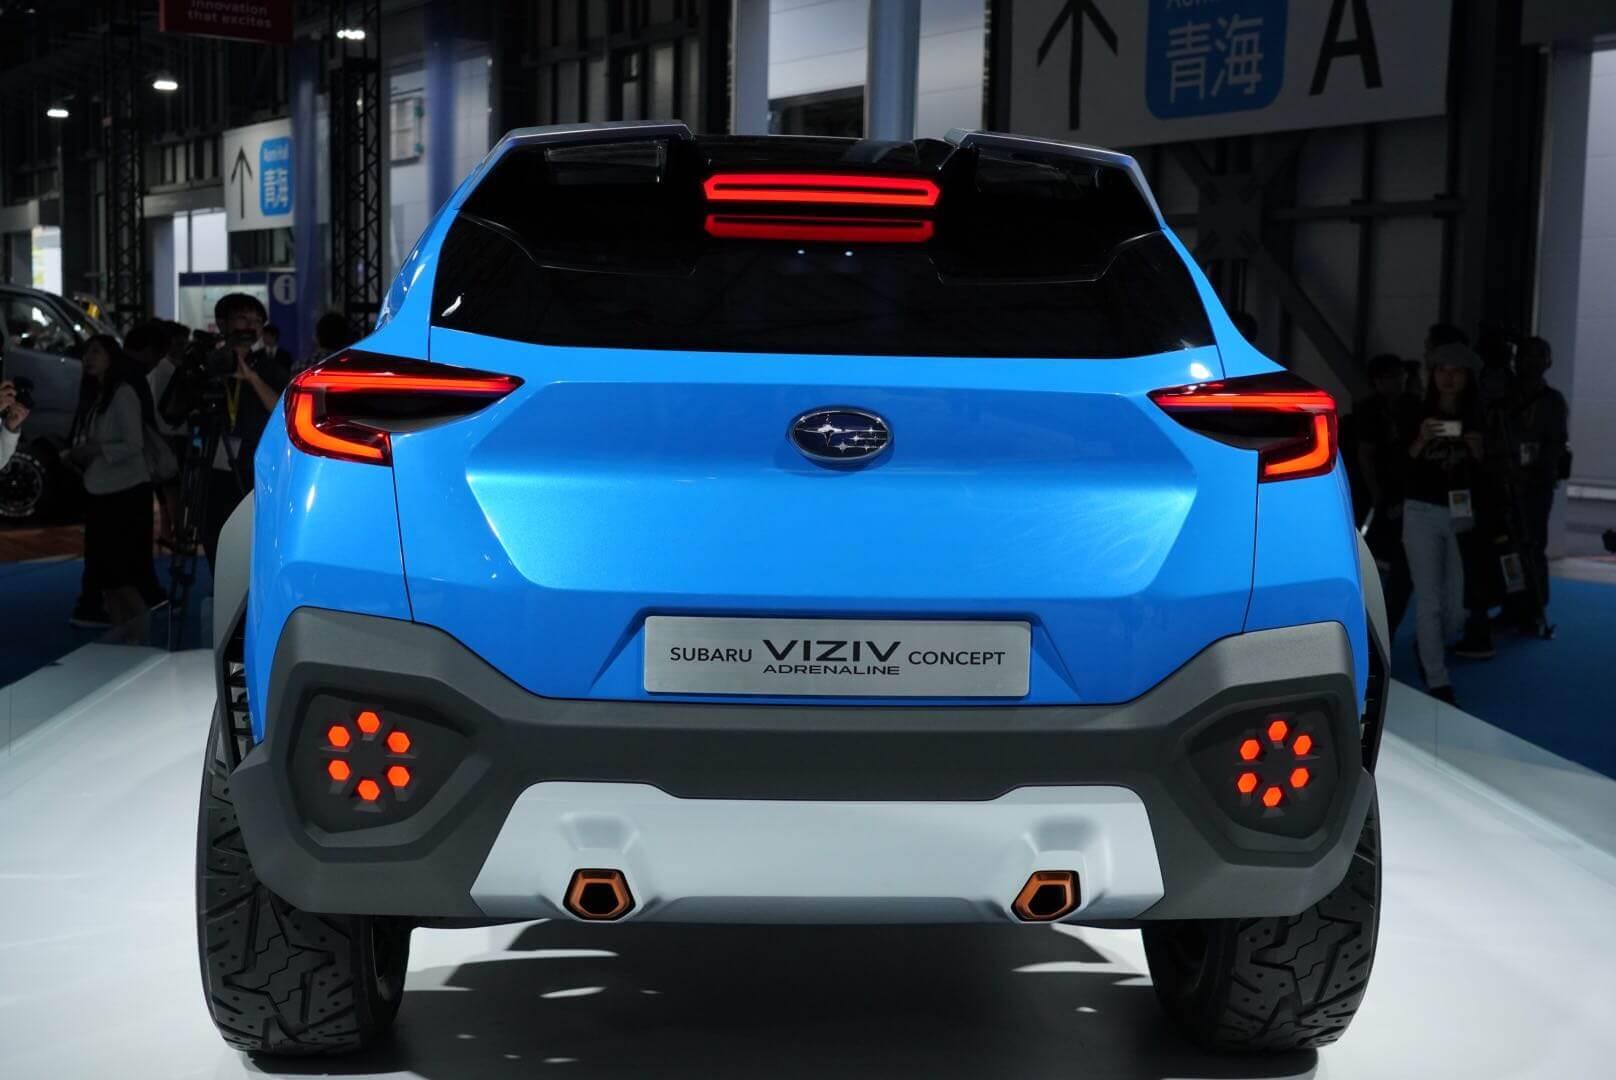 SUBARU VIZIV ADRENALINE CONCEPT(スバル VISIV アドレナリン コンセプト)東京モーターショー2019